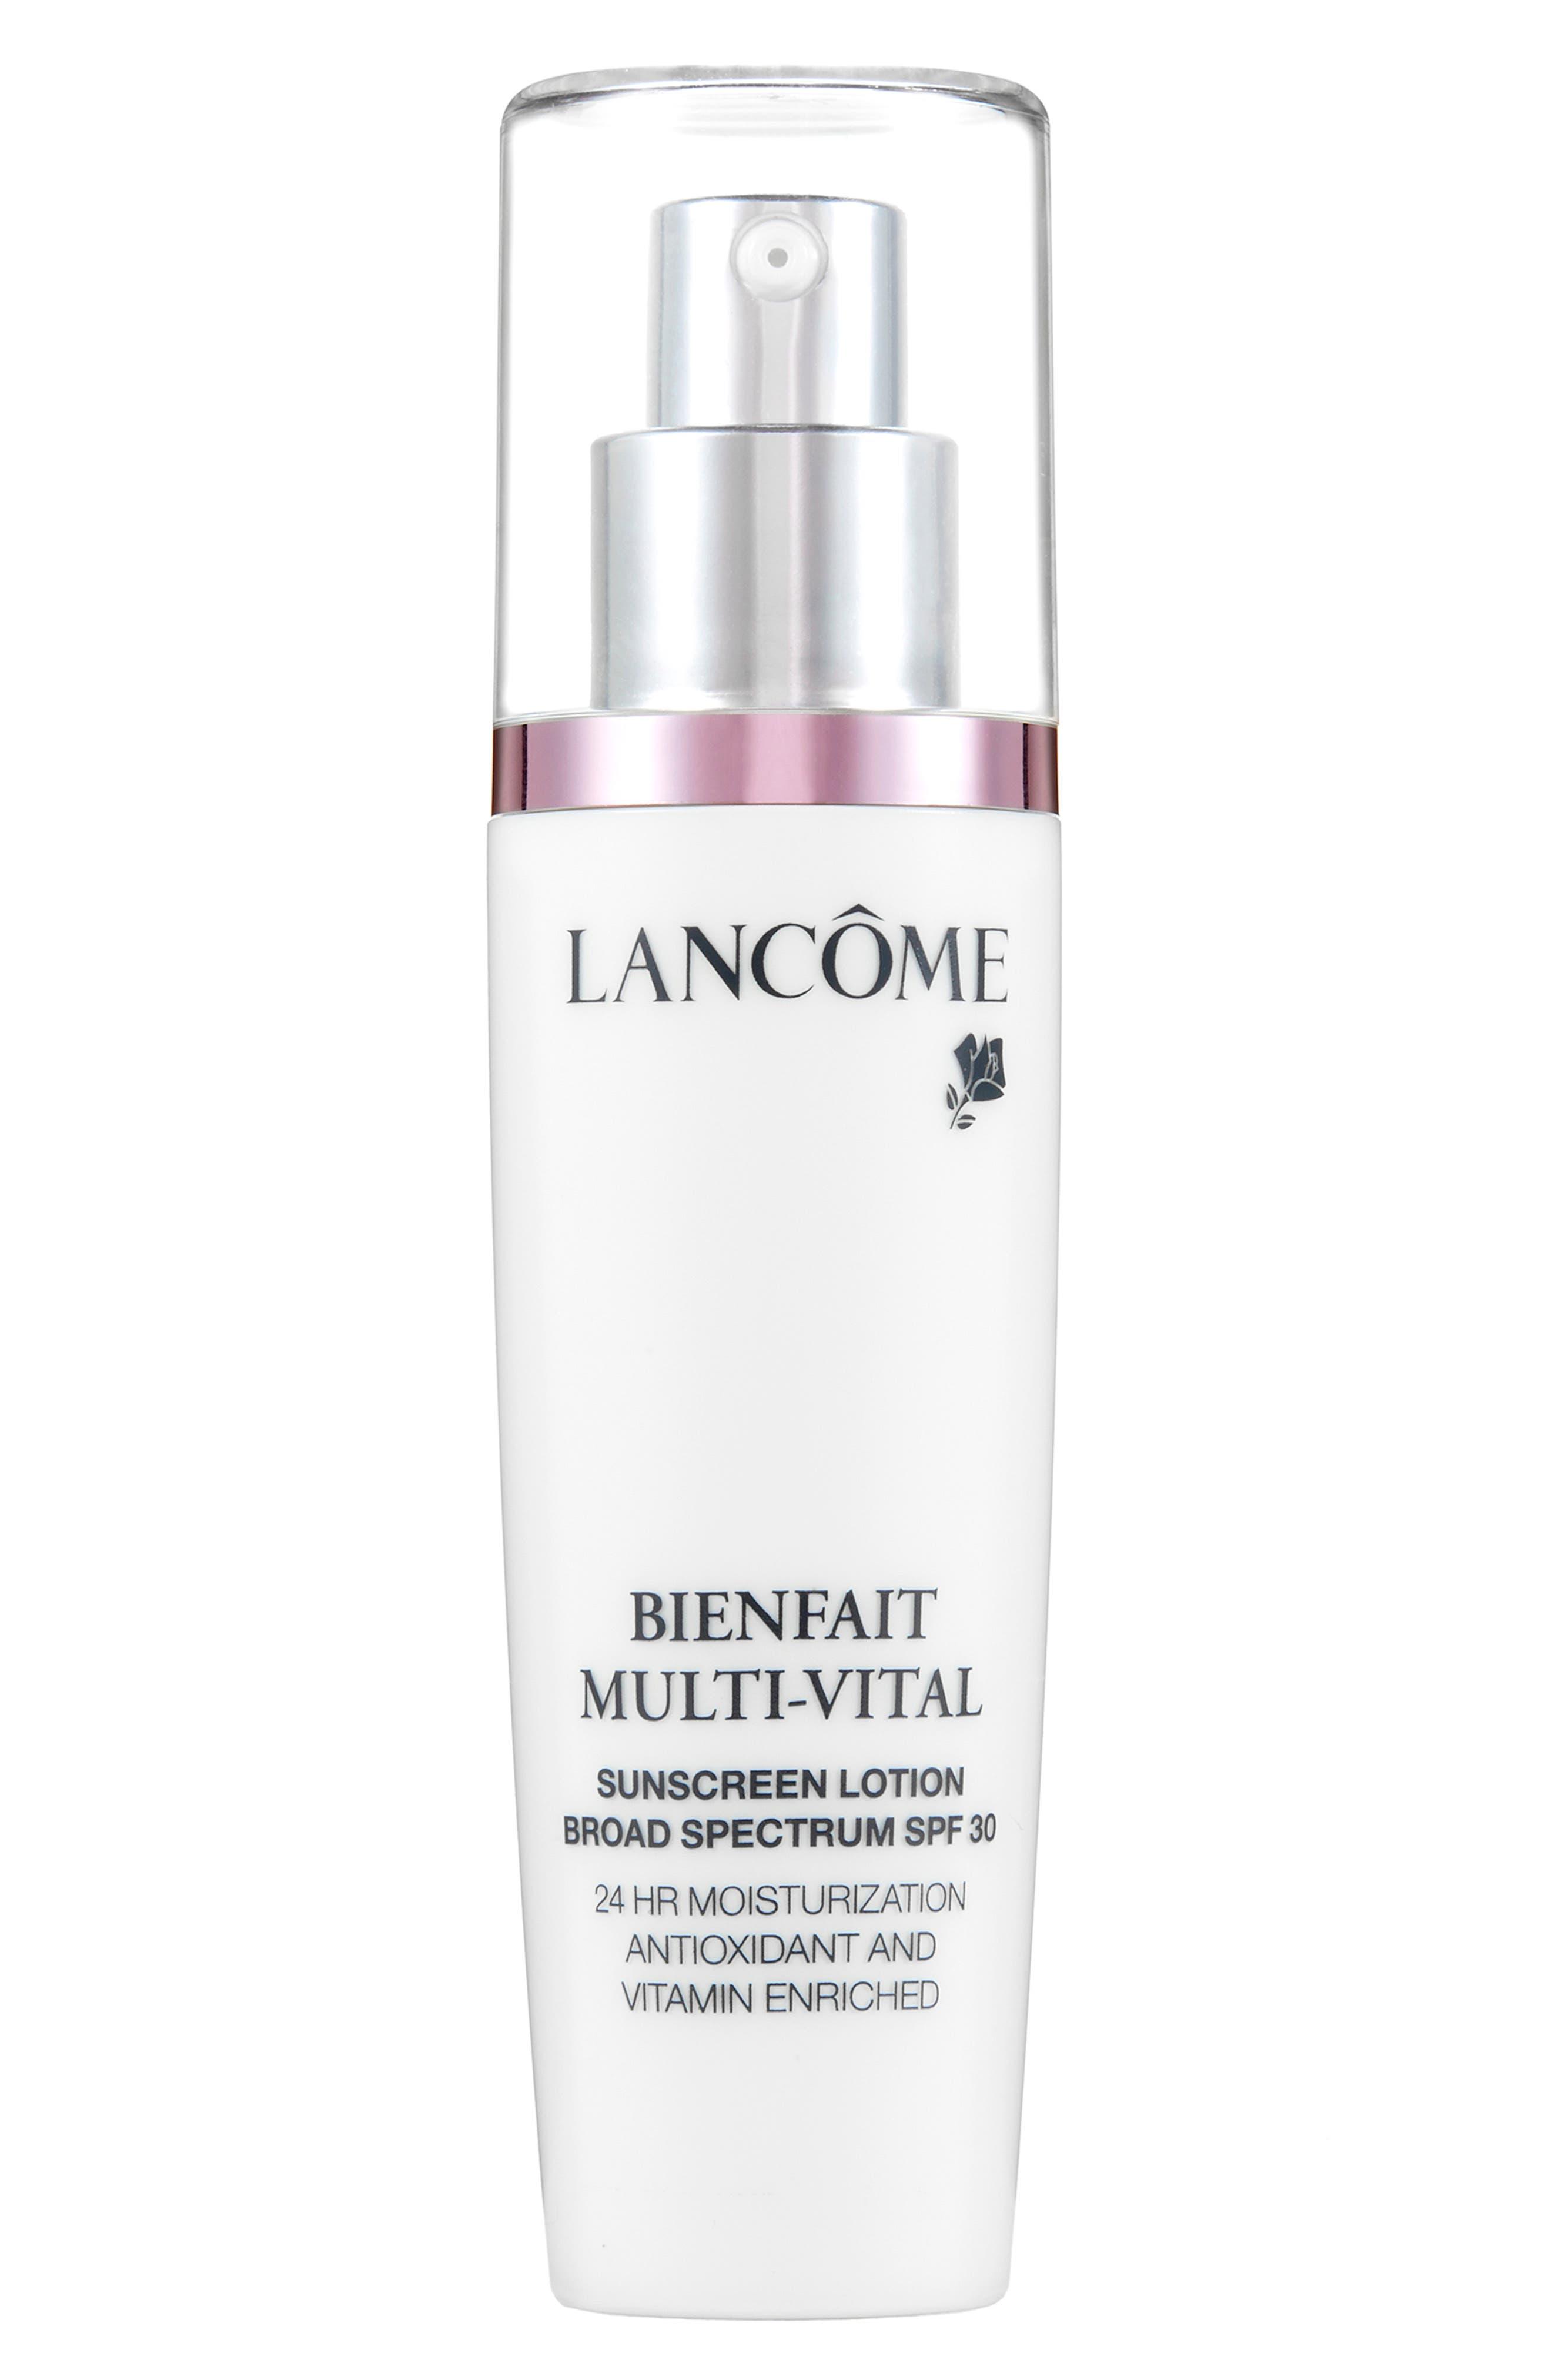 Lancome Bienfait Multi-Vital Sunscreen Lotion Broad Spectrum Spf 30